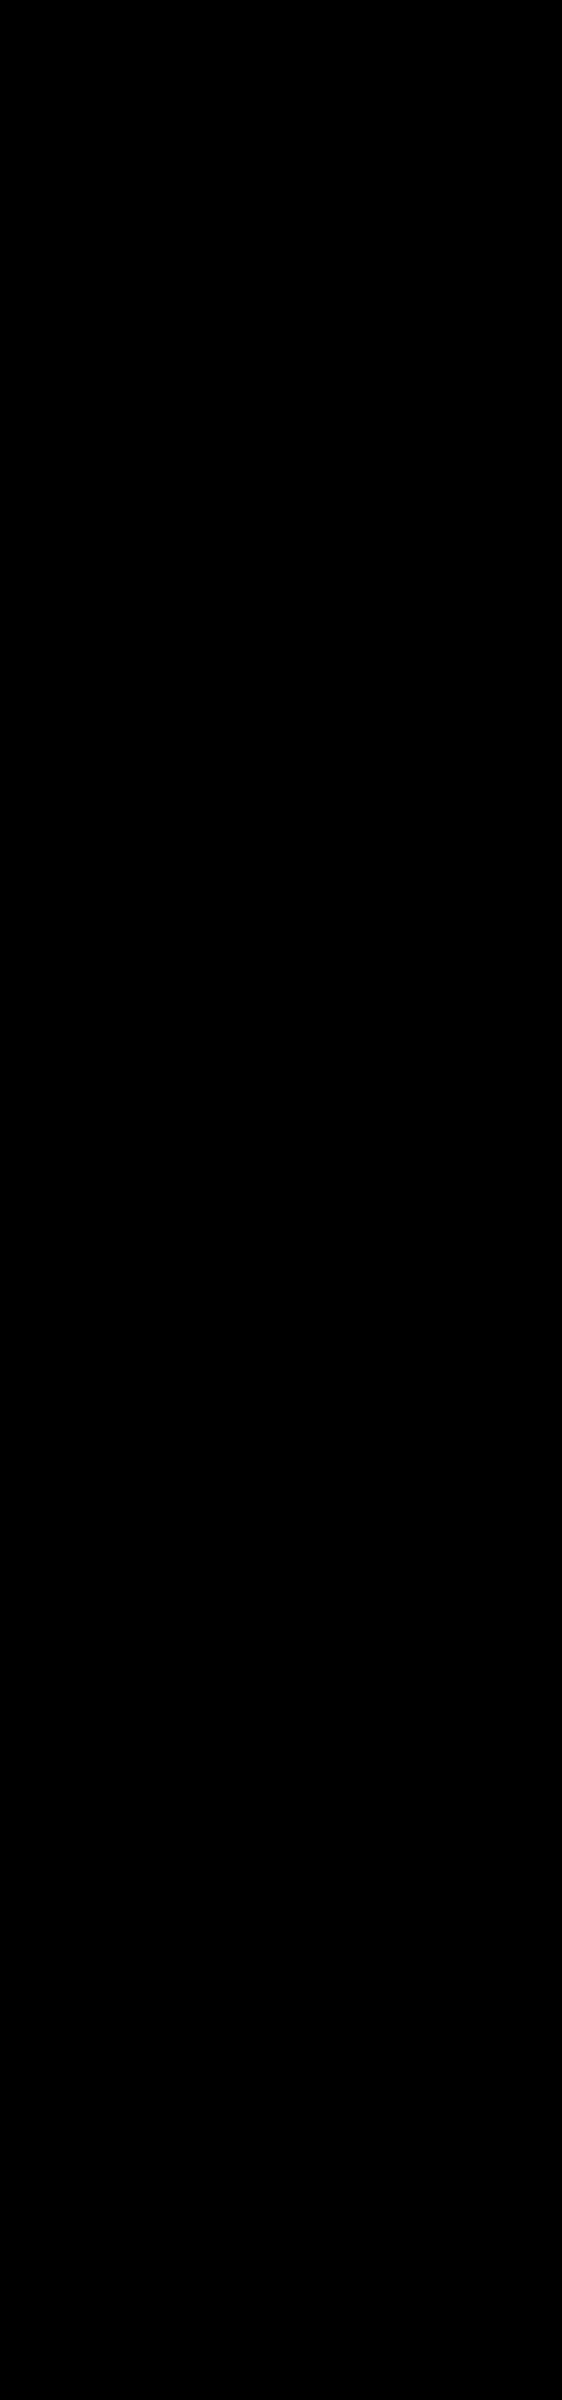 Clipart shield silhouette. Vector sword stock shutterstock